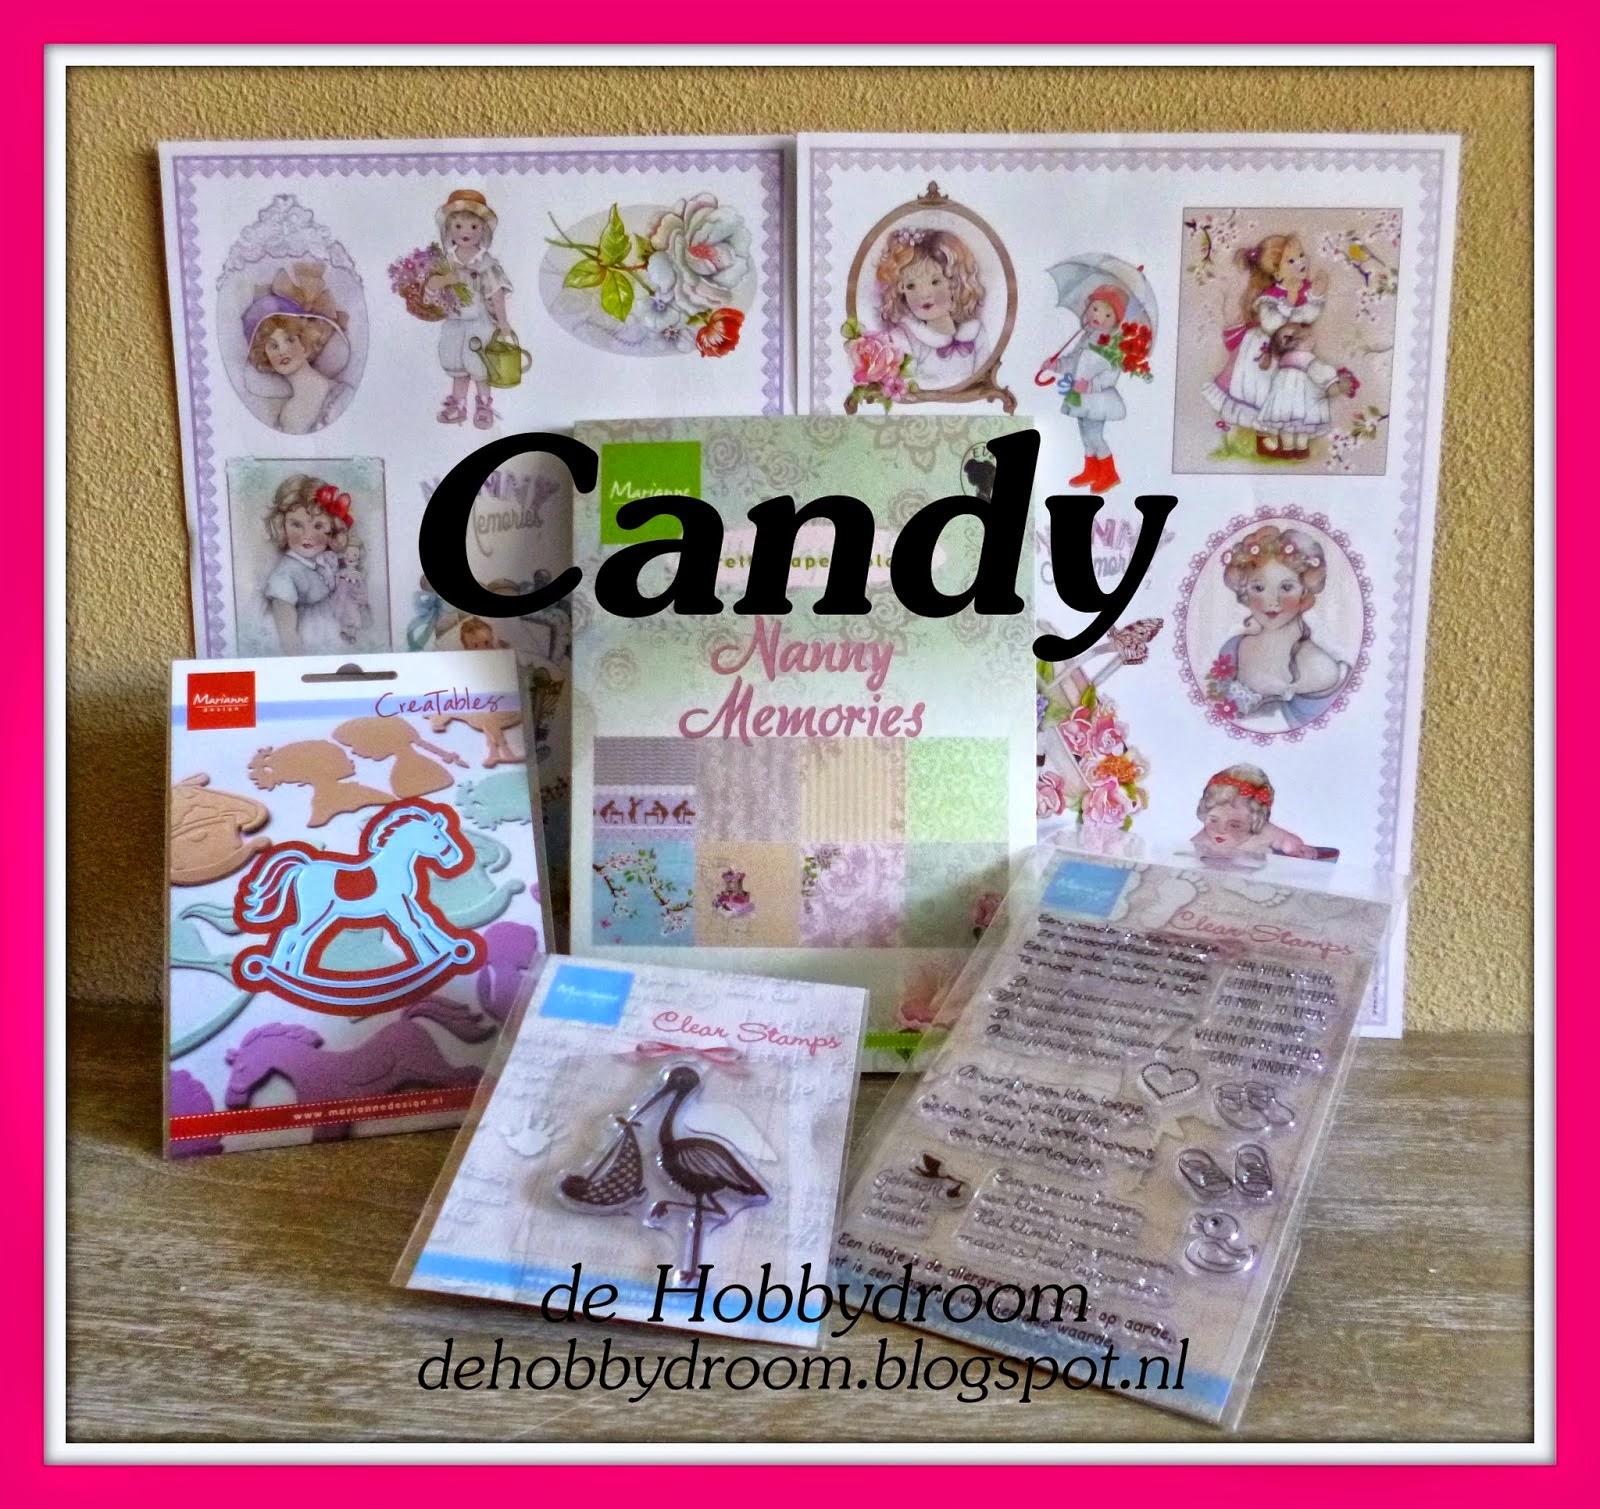 Candy bij de Hobbydroom